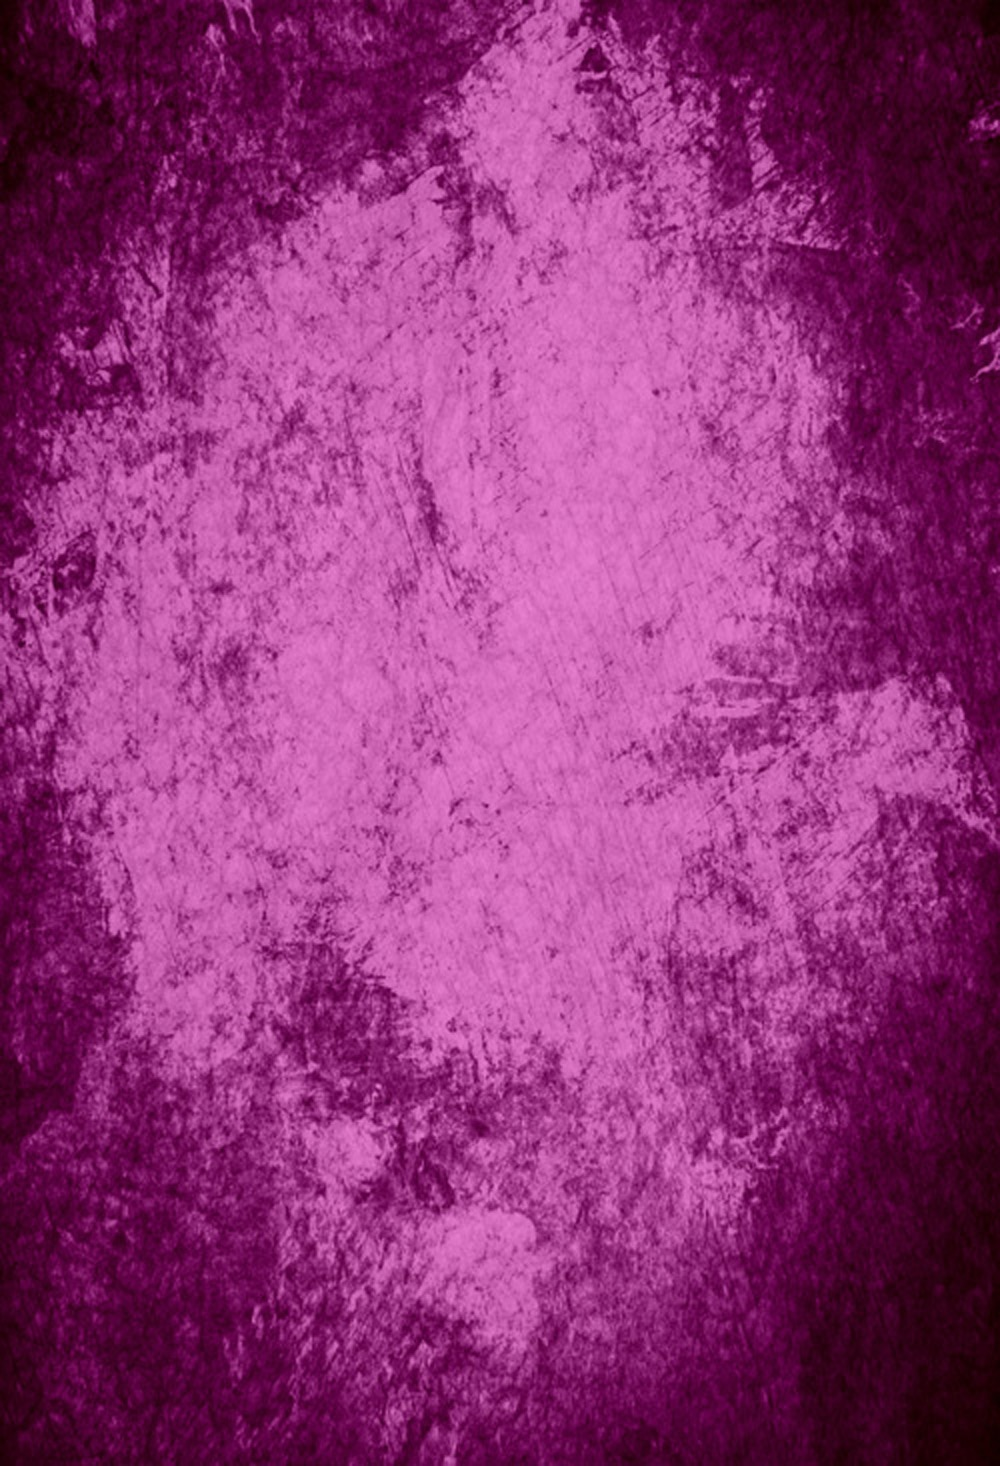 Fondo huayi arte tela recién nacido telón de fondo niños Fotografía accesorios Foto fondo rosa XT-4638